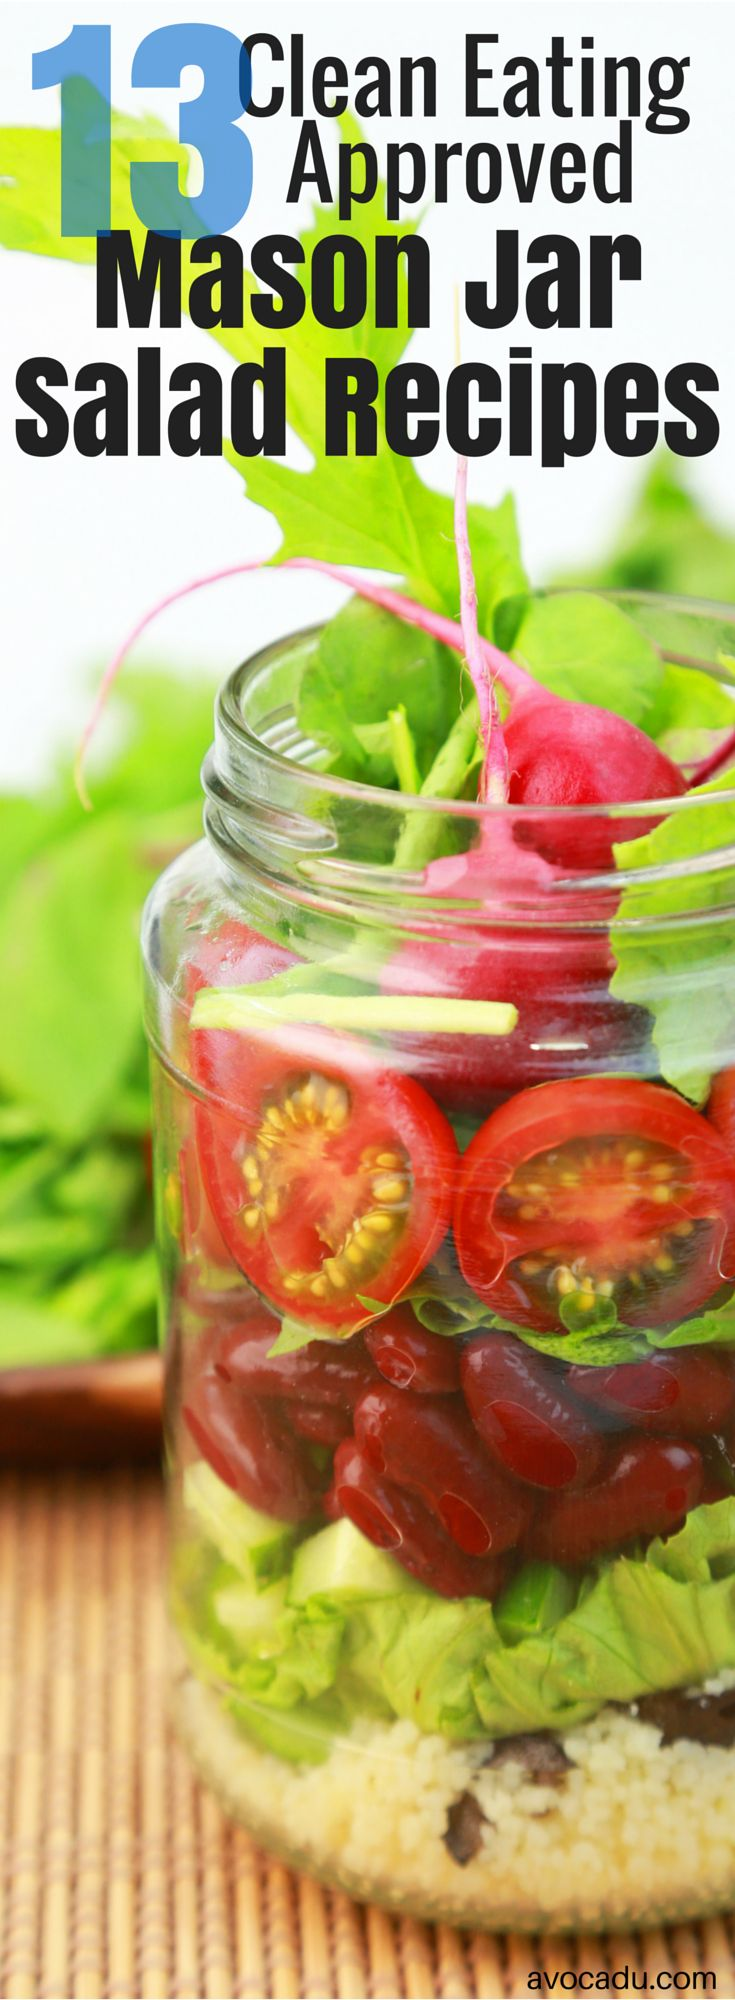 13 Clean Eating Approved Mason Jar Salad Recipes   Avocadu.com